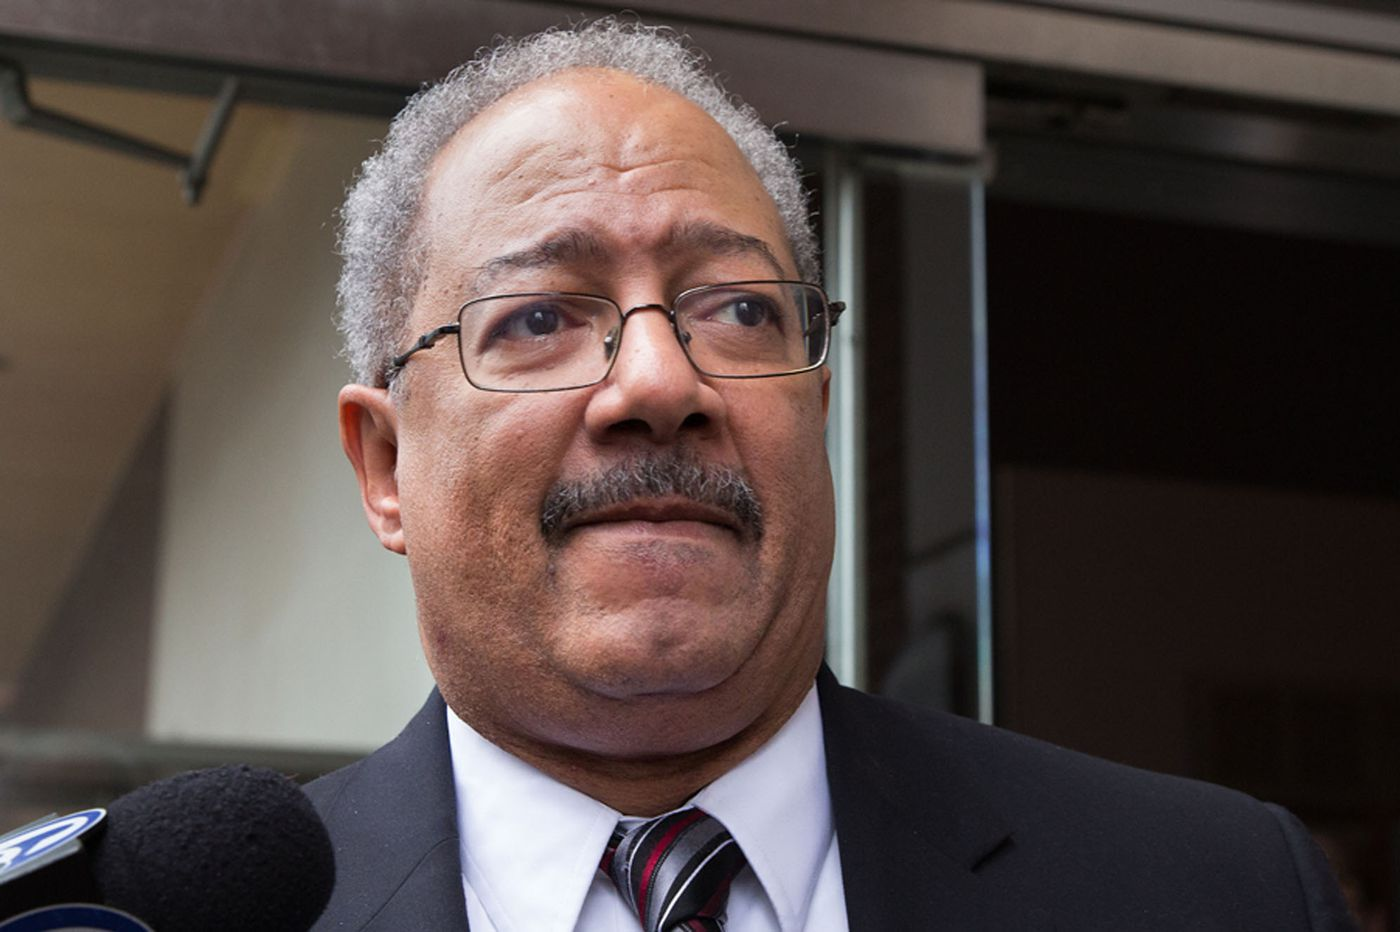 Chaka Fattah loses bid to have U.S. Supreme Court consider his appeal